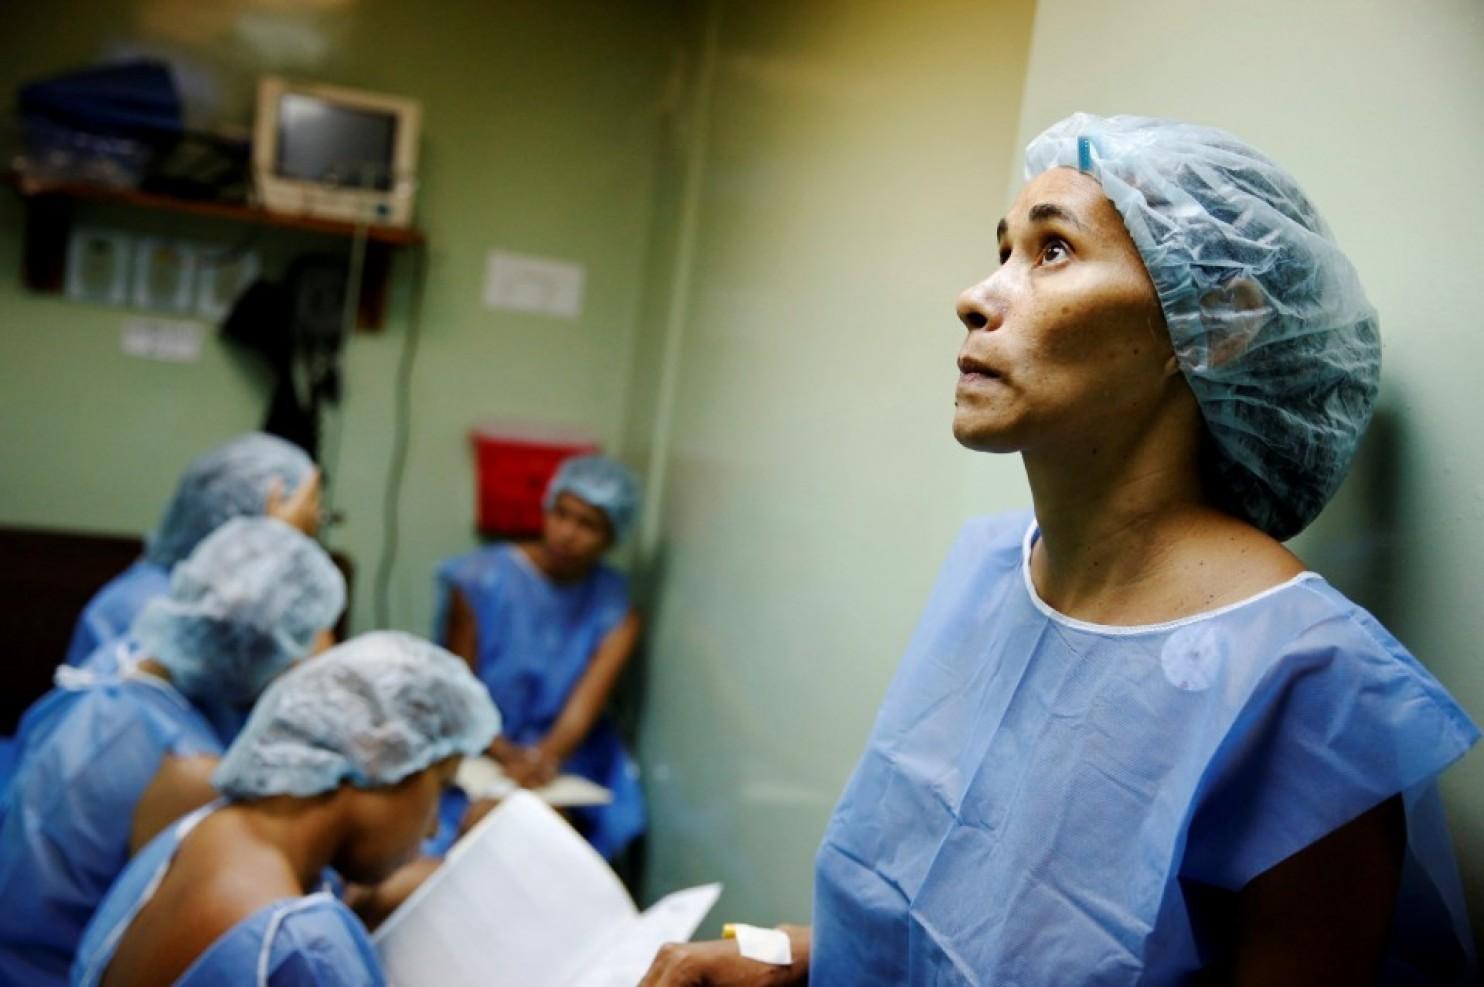 Venezuelan women's response to the country's economic crisis: Get sterilized